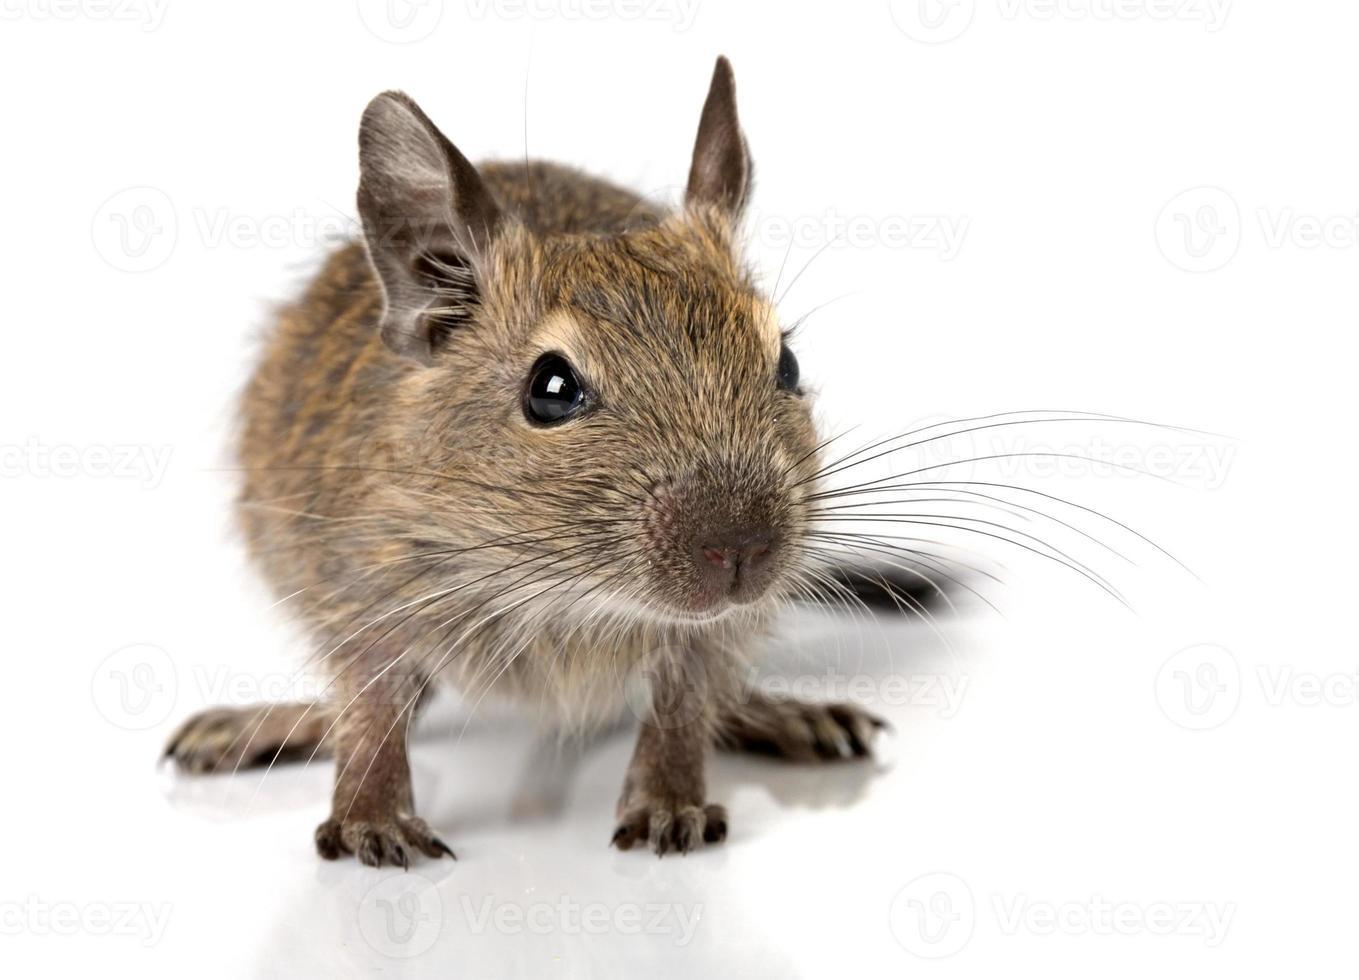 cute small baby rodent degu pet closeup photo